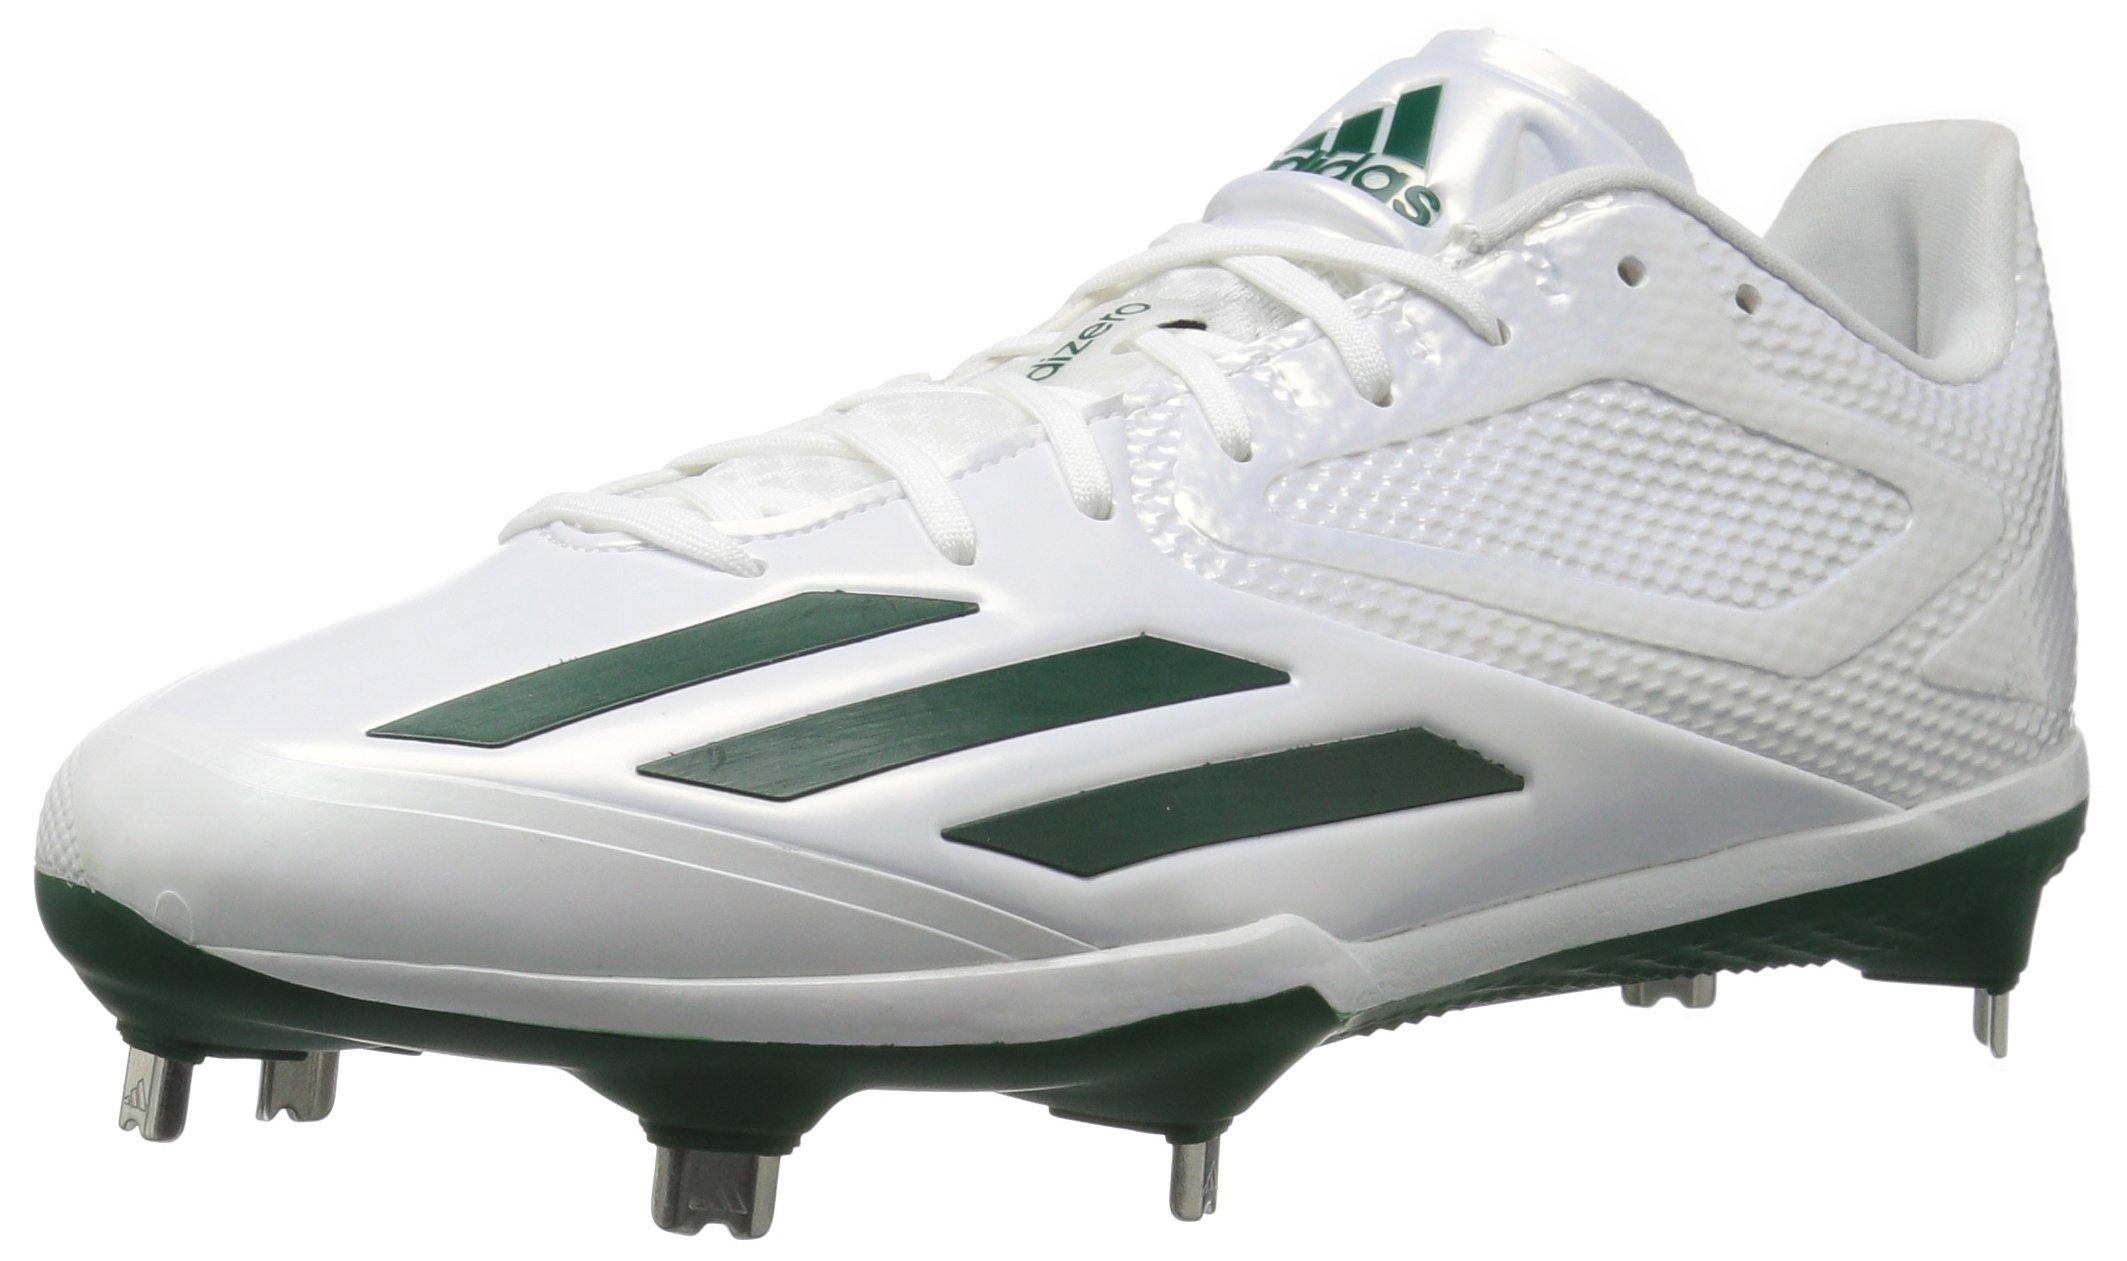 b1054f451 Galleon - Adidas Adizero Afterburner 3 Baseball Shoe